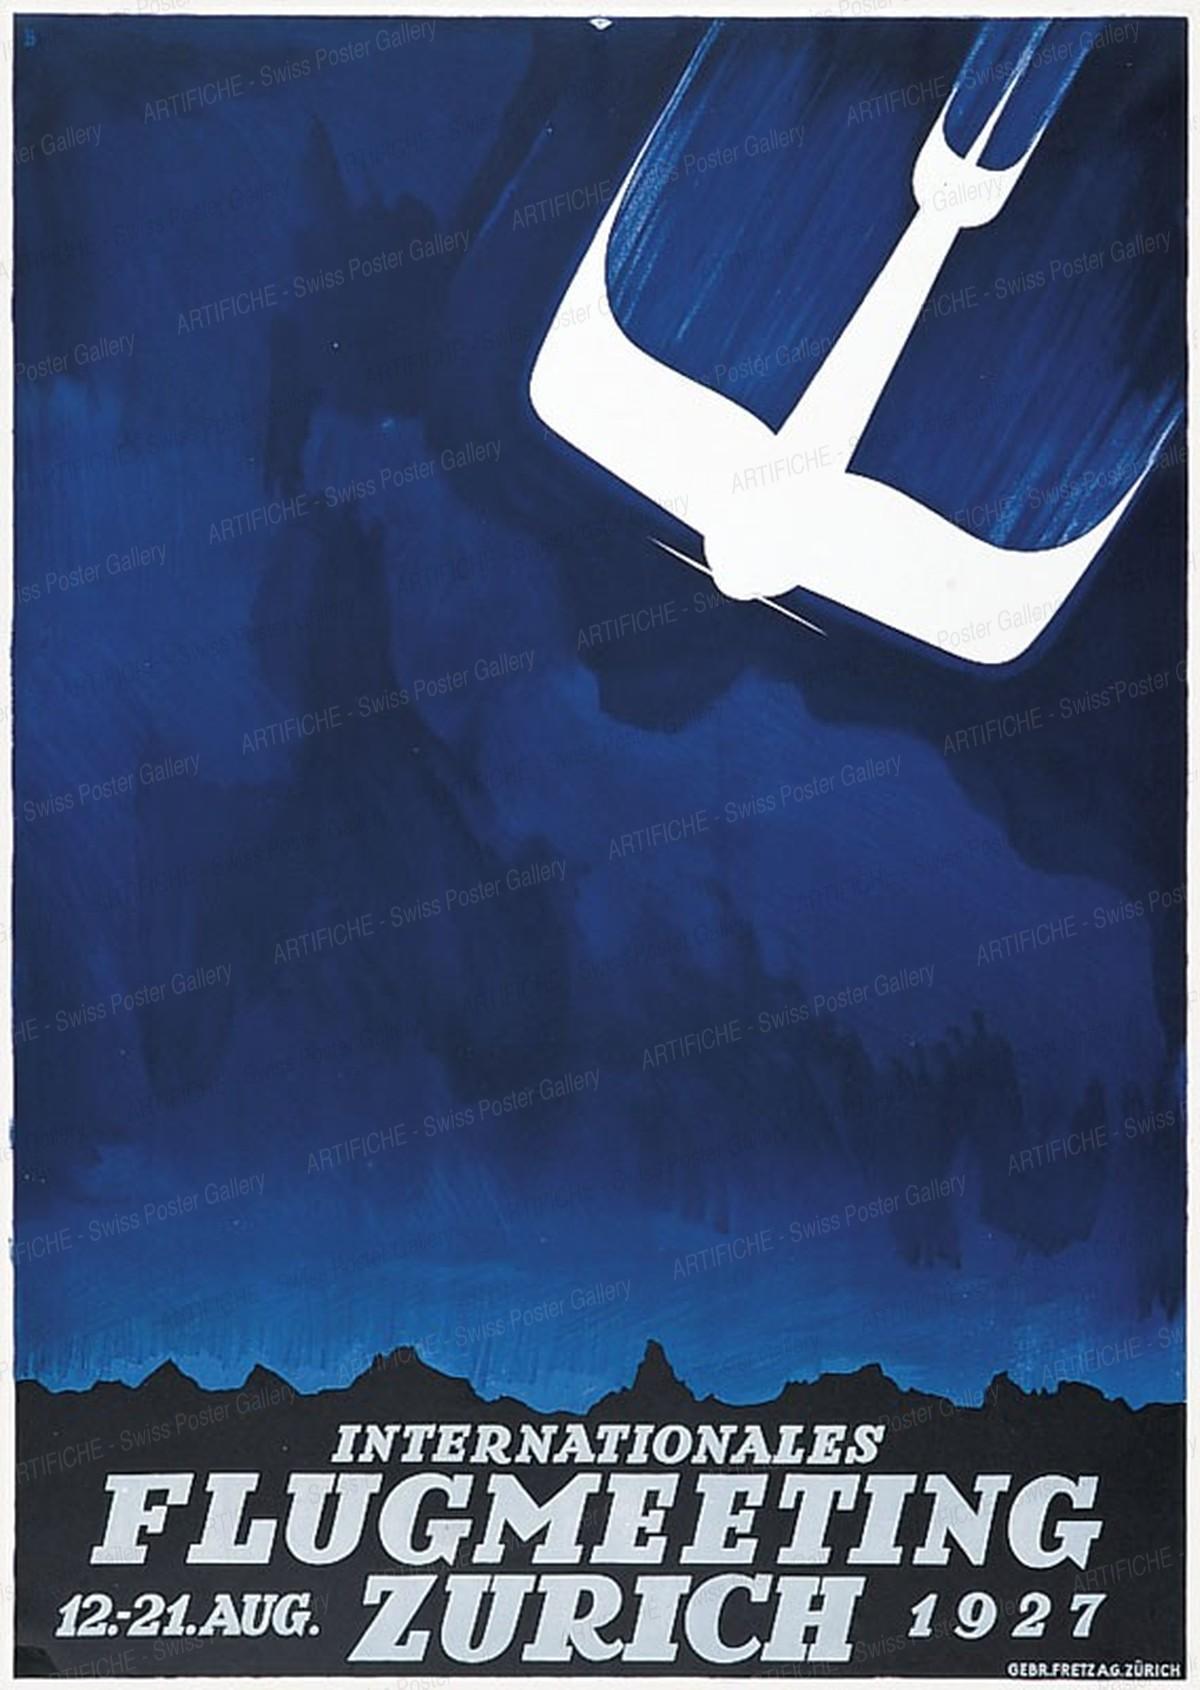 Internationales Flugmeeting Zürich – 12.-21. Aug. 1927, Otto Baumberger